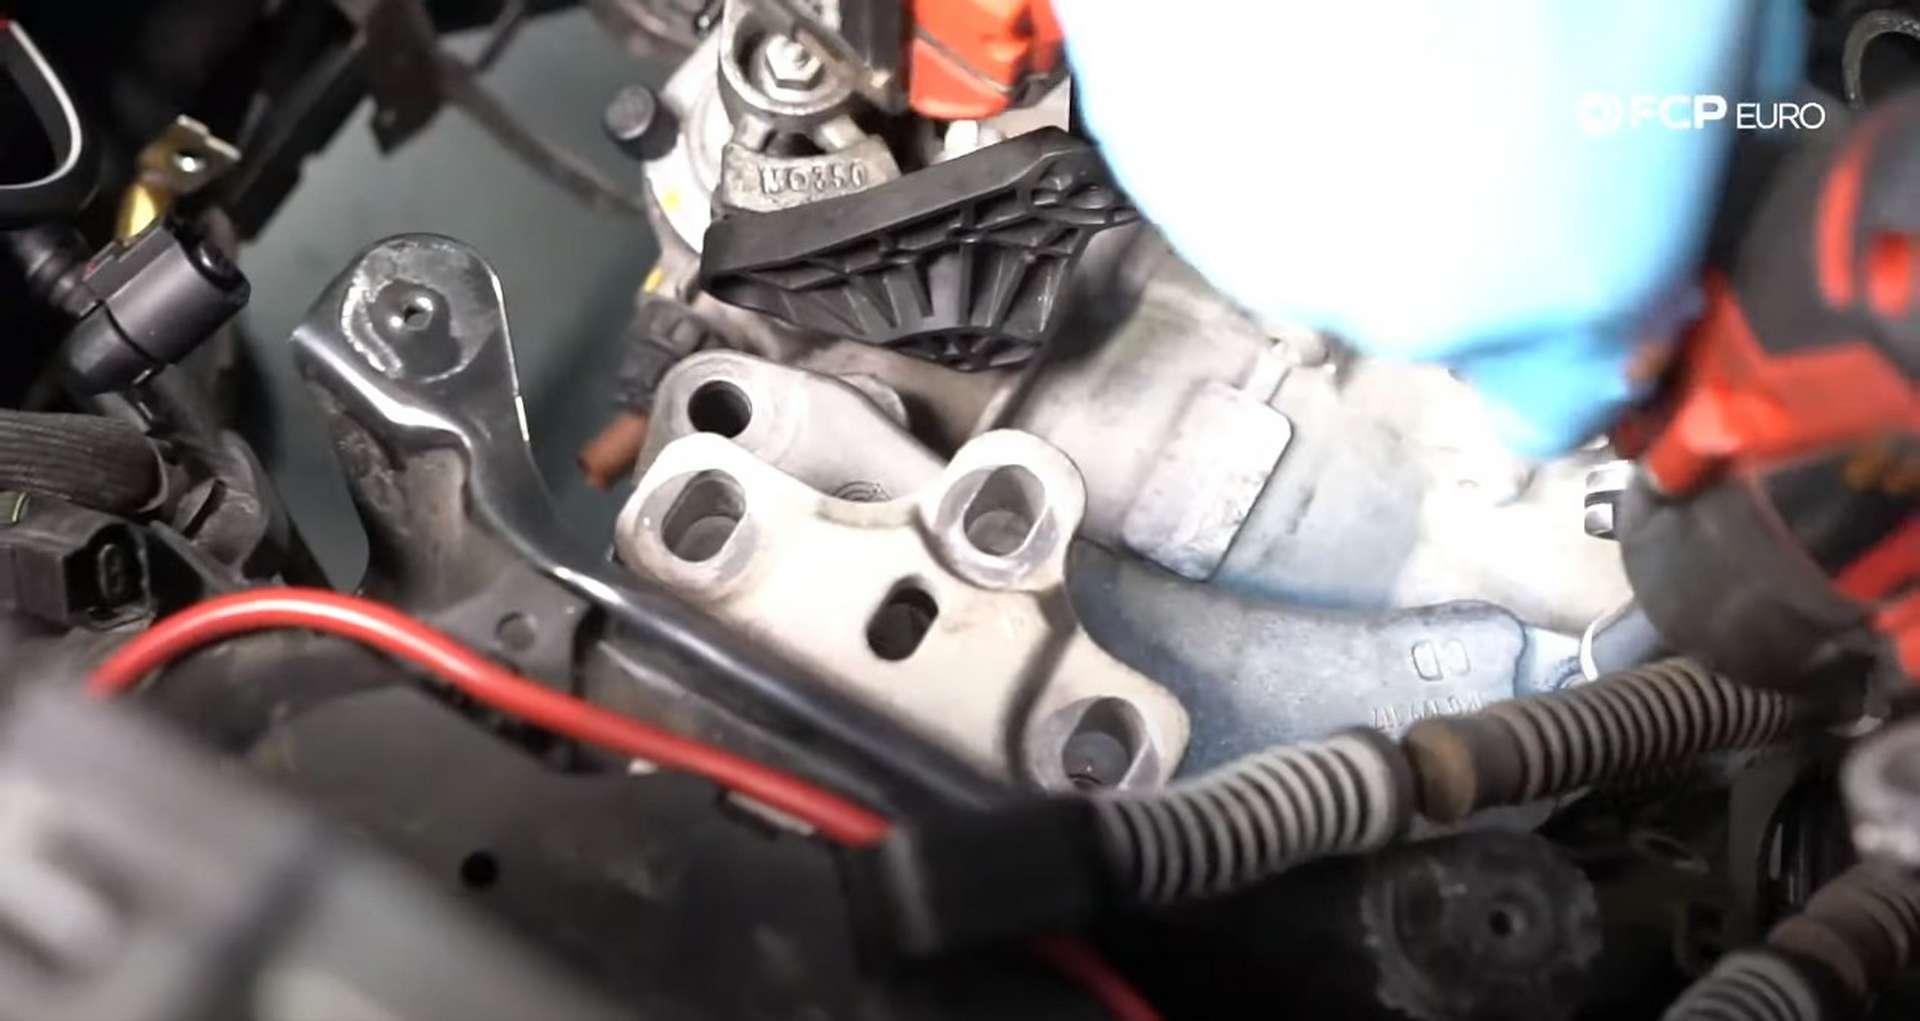 40-DIY_VW_GTI_Clutch-Job-Removing-Transmission